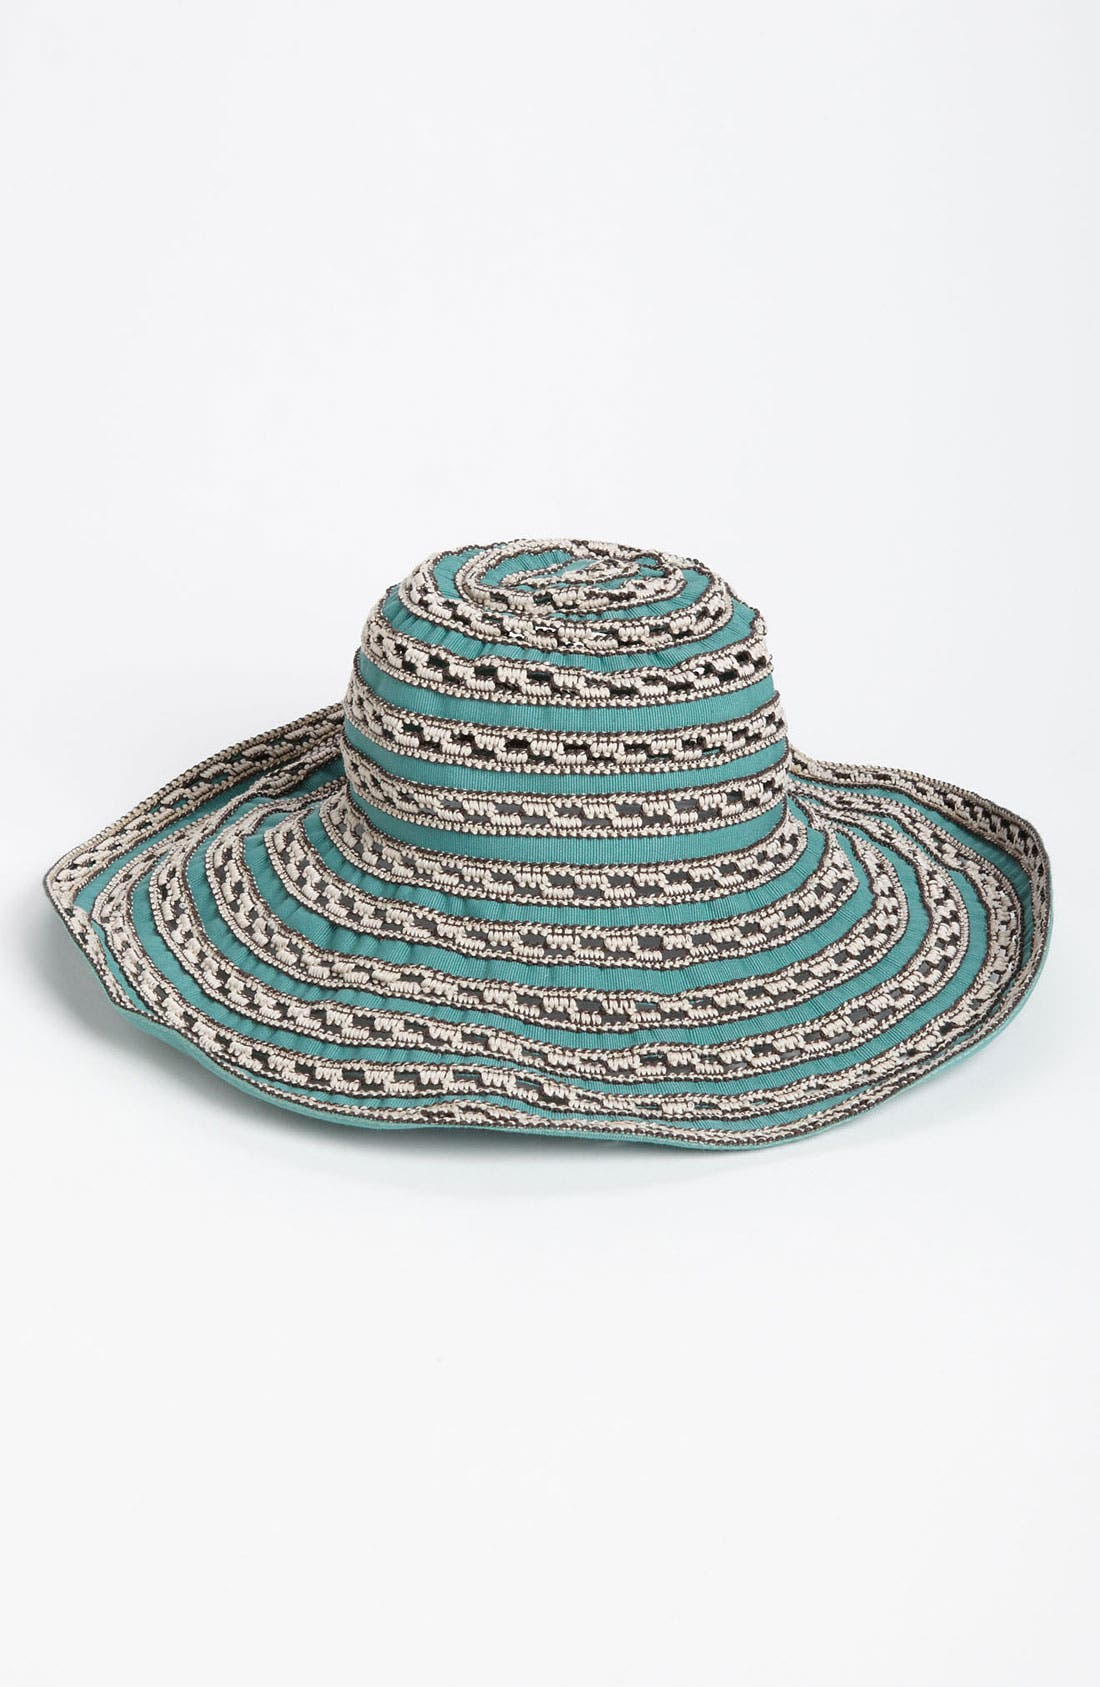 Main Image - Nordstrom 'Capello' Floppy Hat